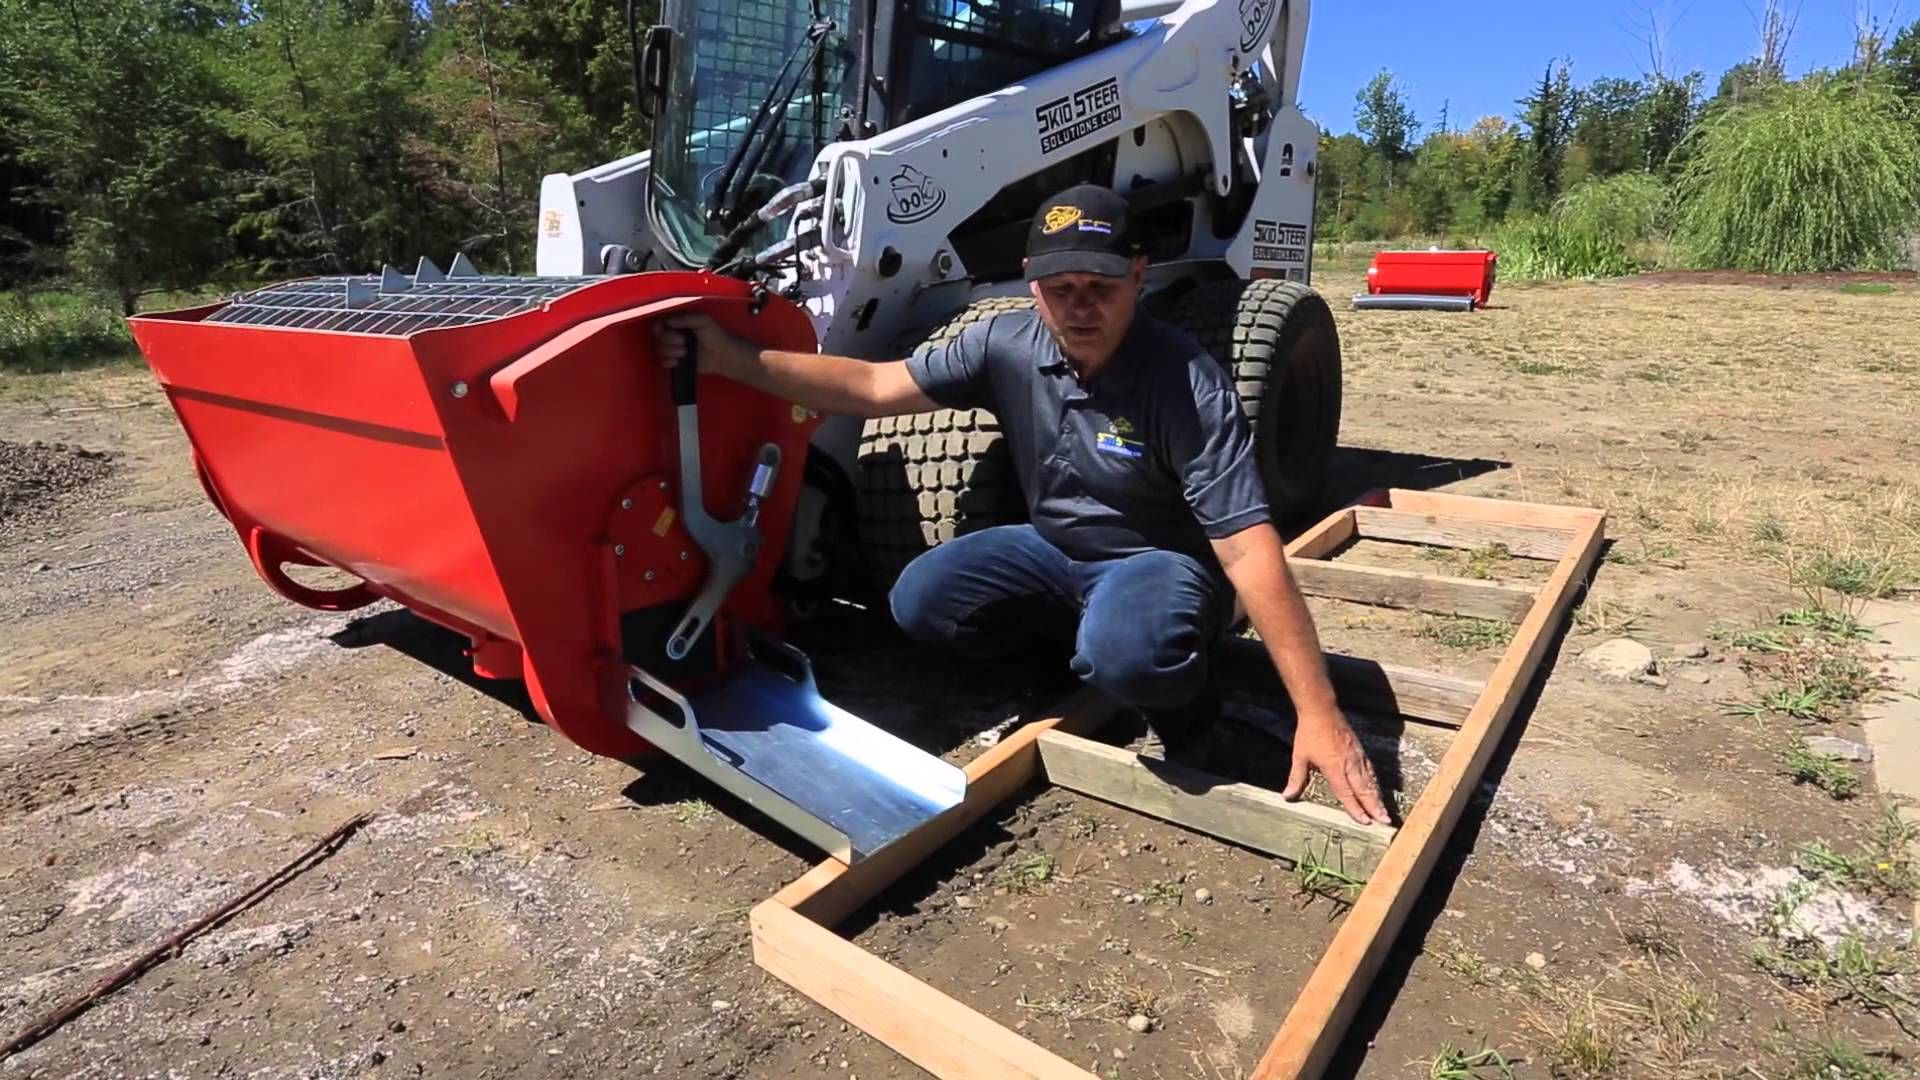 Skid Steer Cement Mixer - Eterra BMX-250 and the Mix & Go